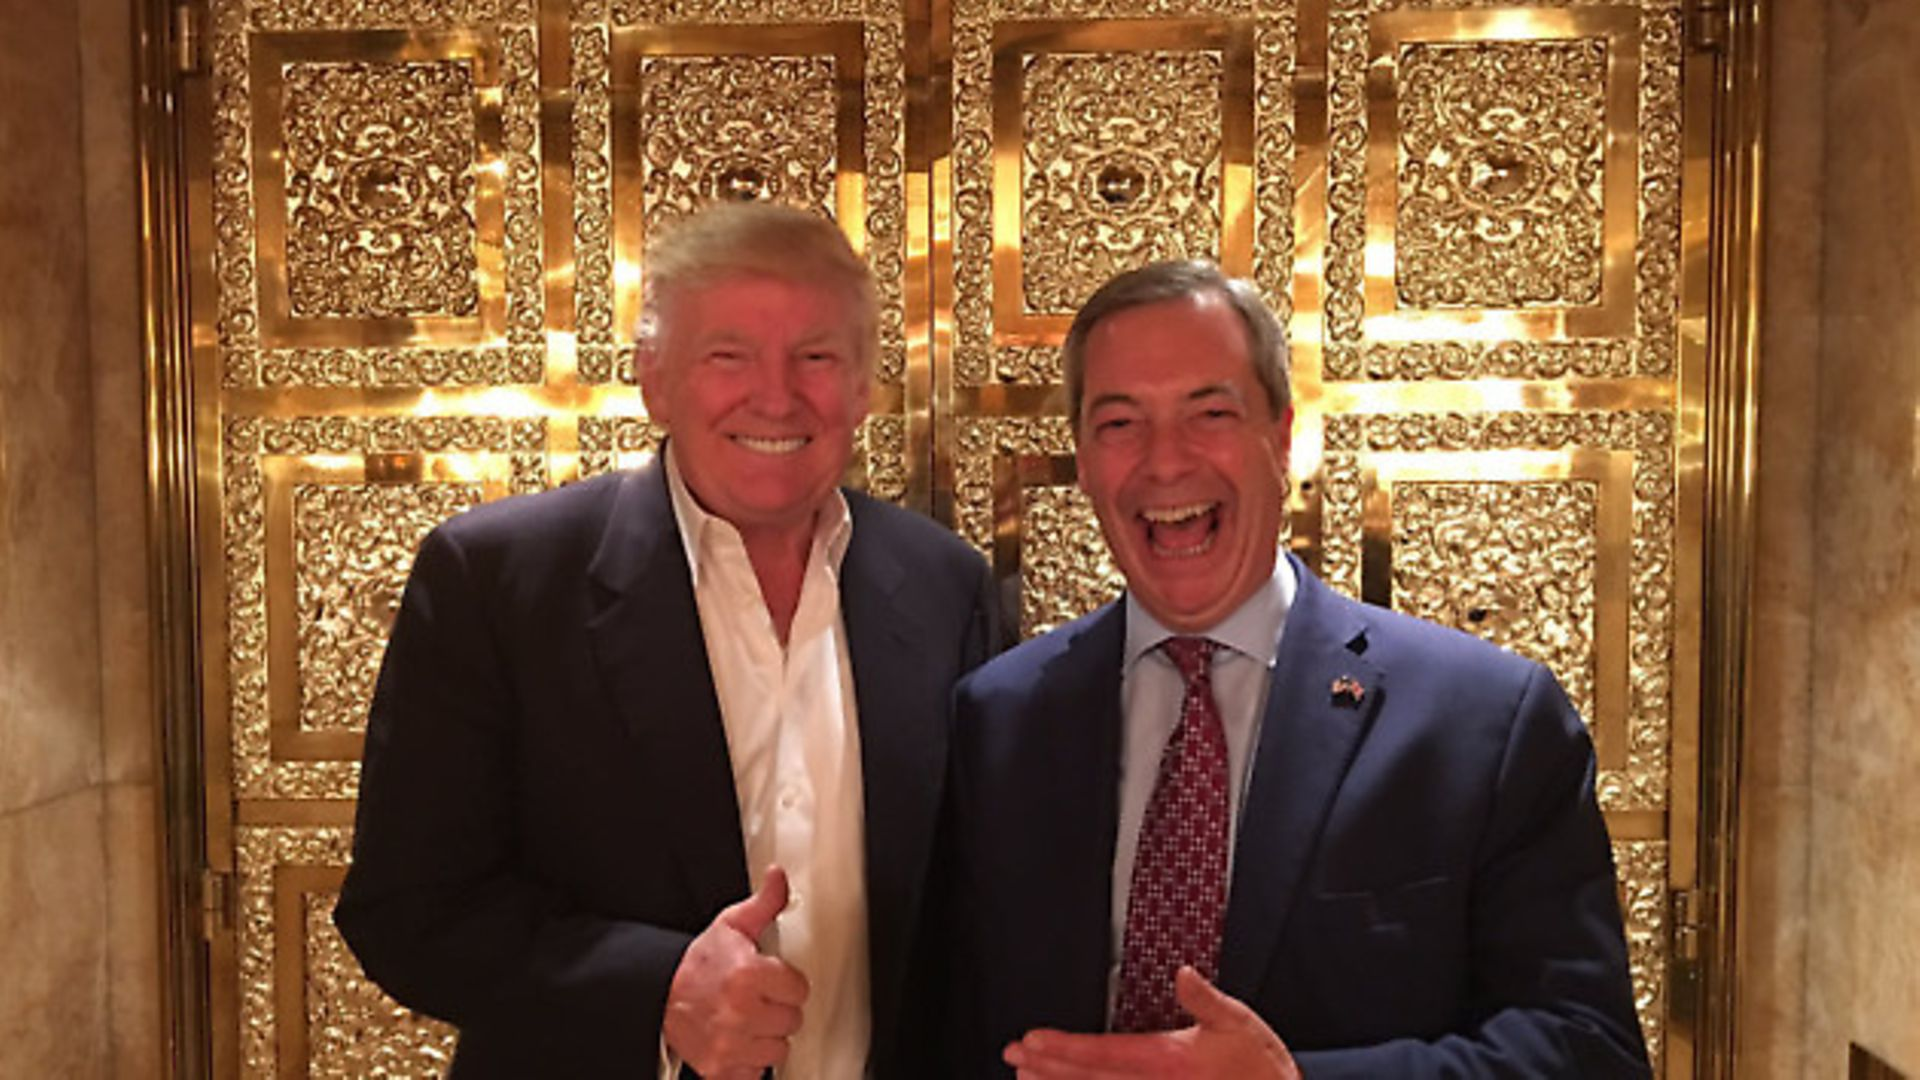 Donald Trump and Nigel Farage - Credit: Archant